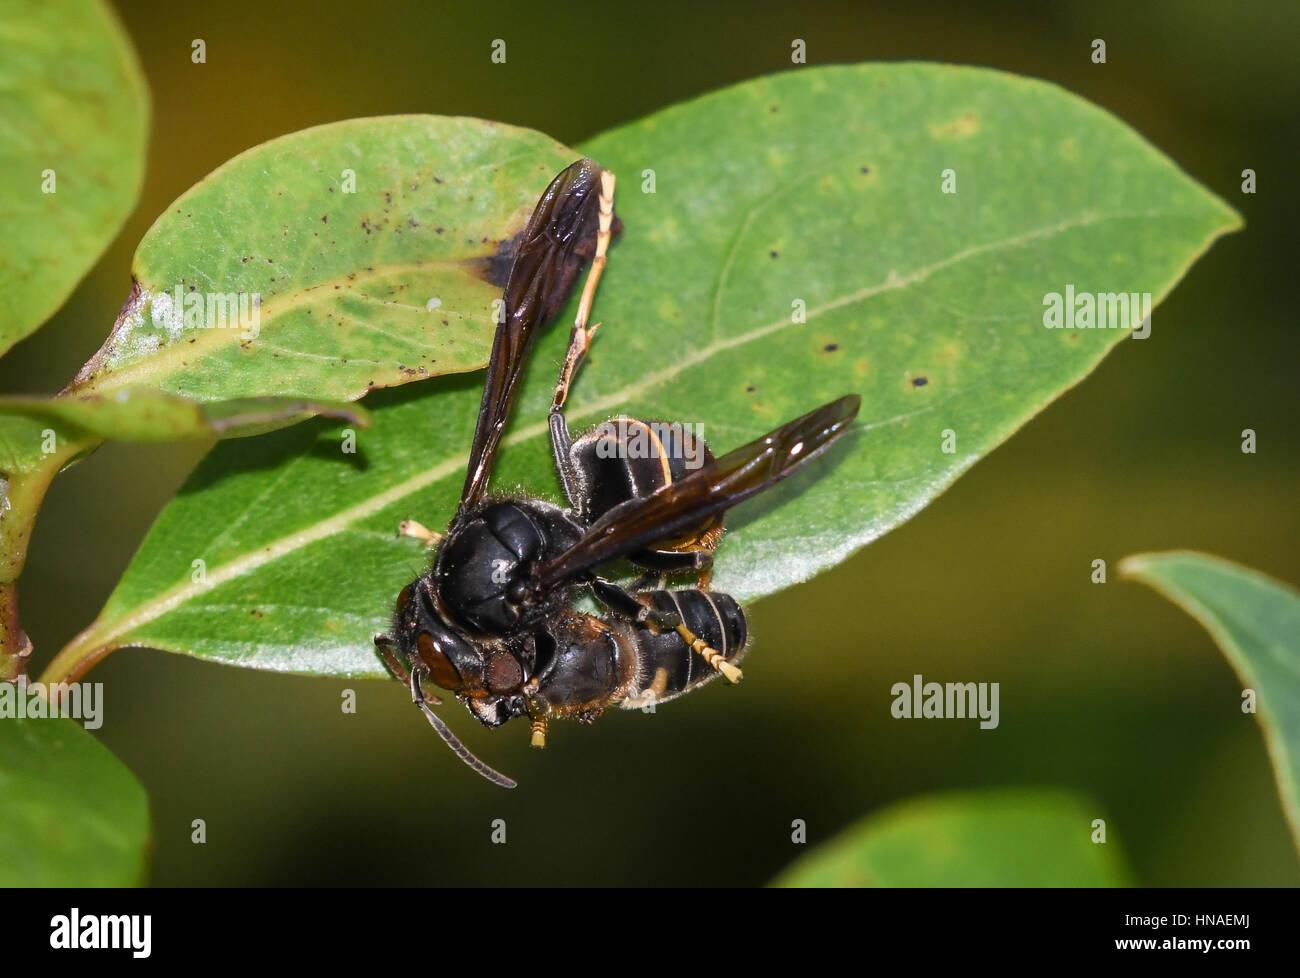 Las avispas asiáticas (Vespa velutina) han invadido la hiedra ...